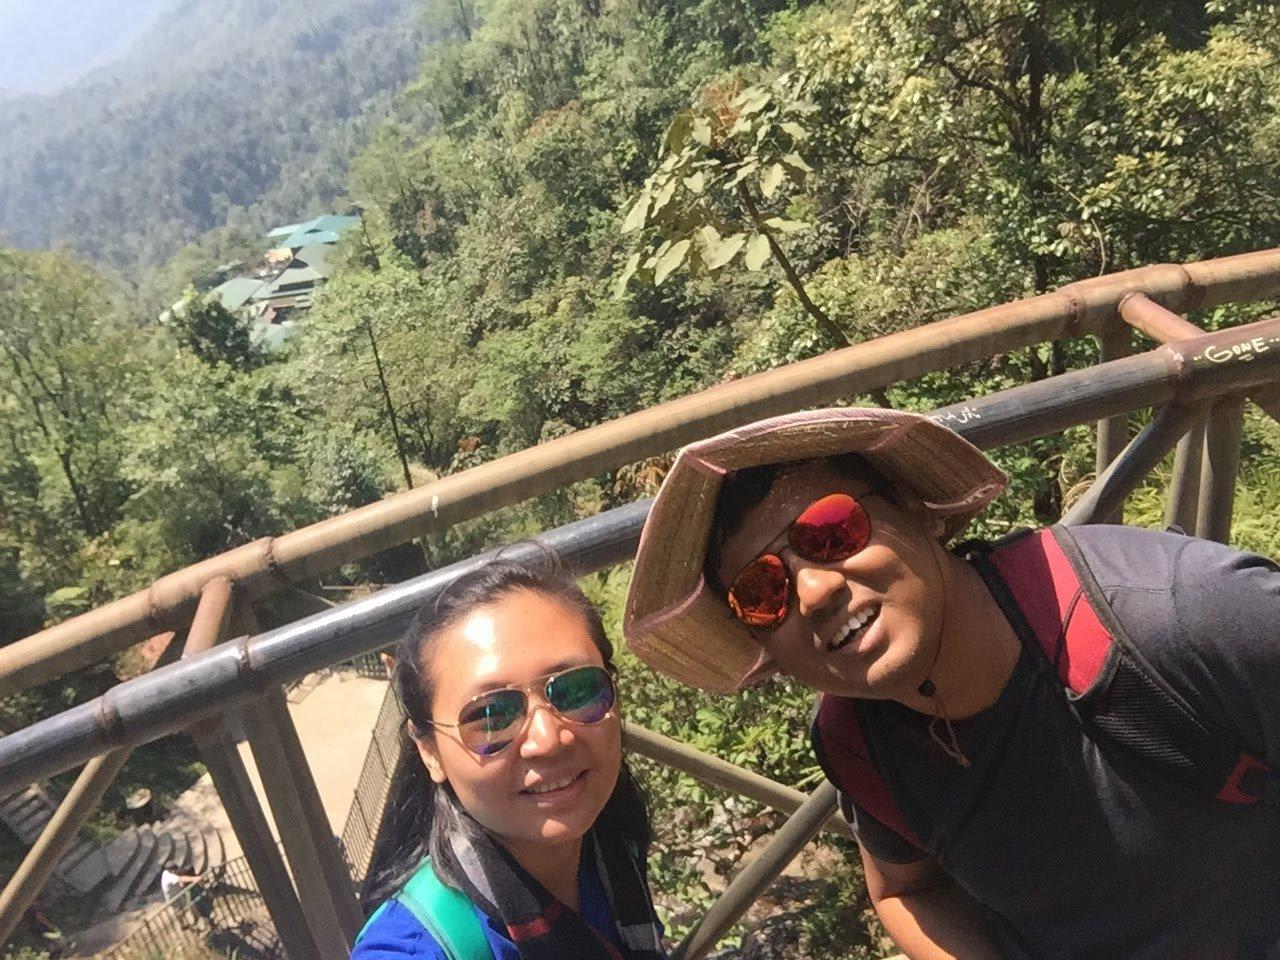 Selfie  | Photo taken by Seng Aung S